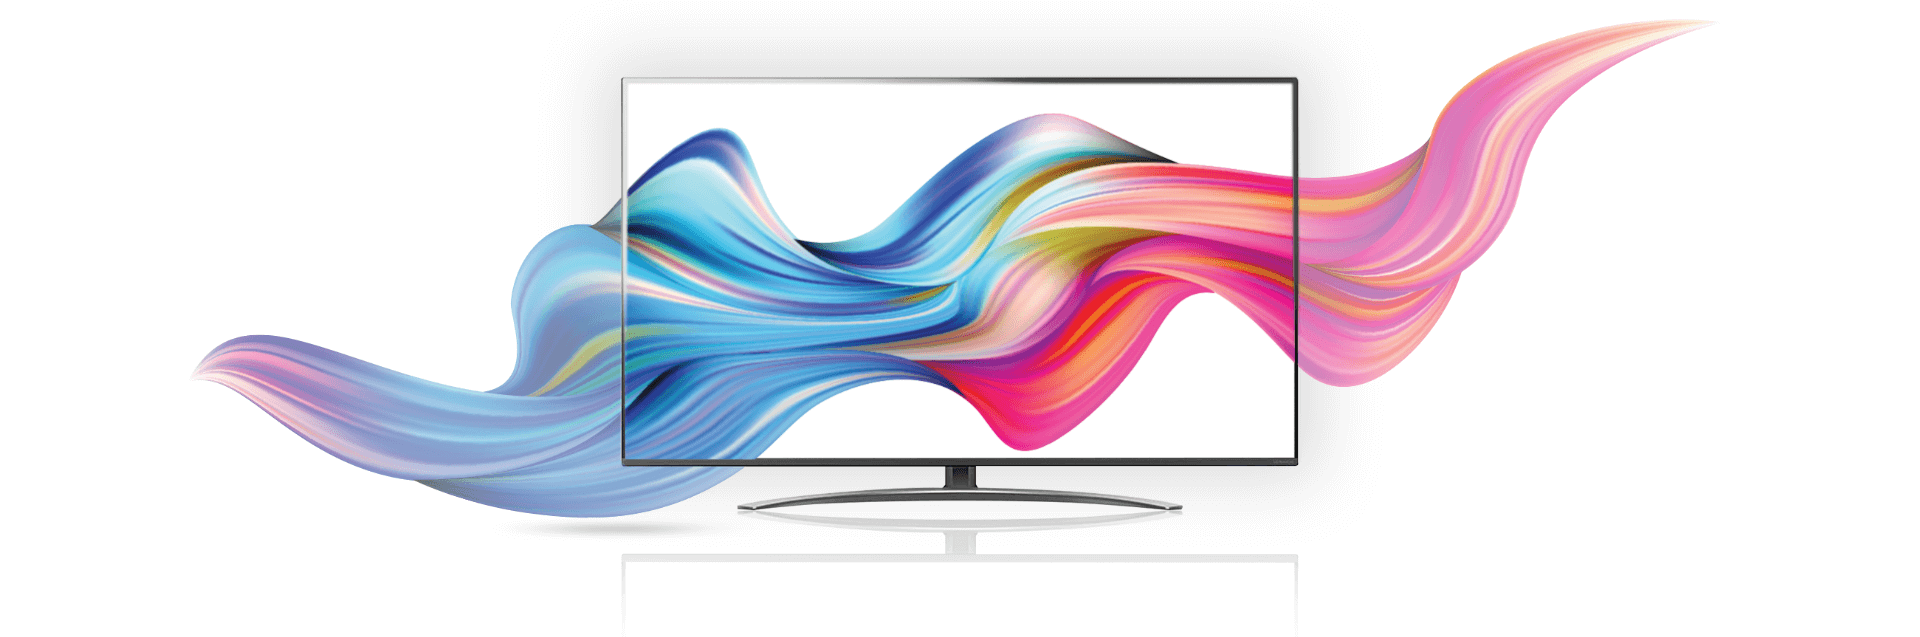 LG NANOCELL TVs 2021